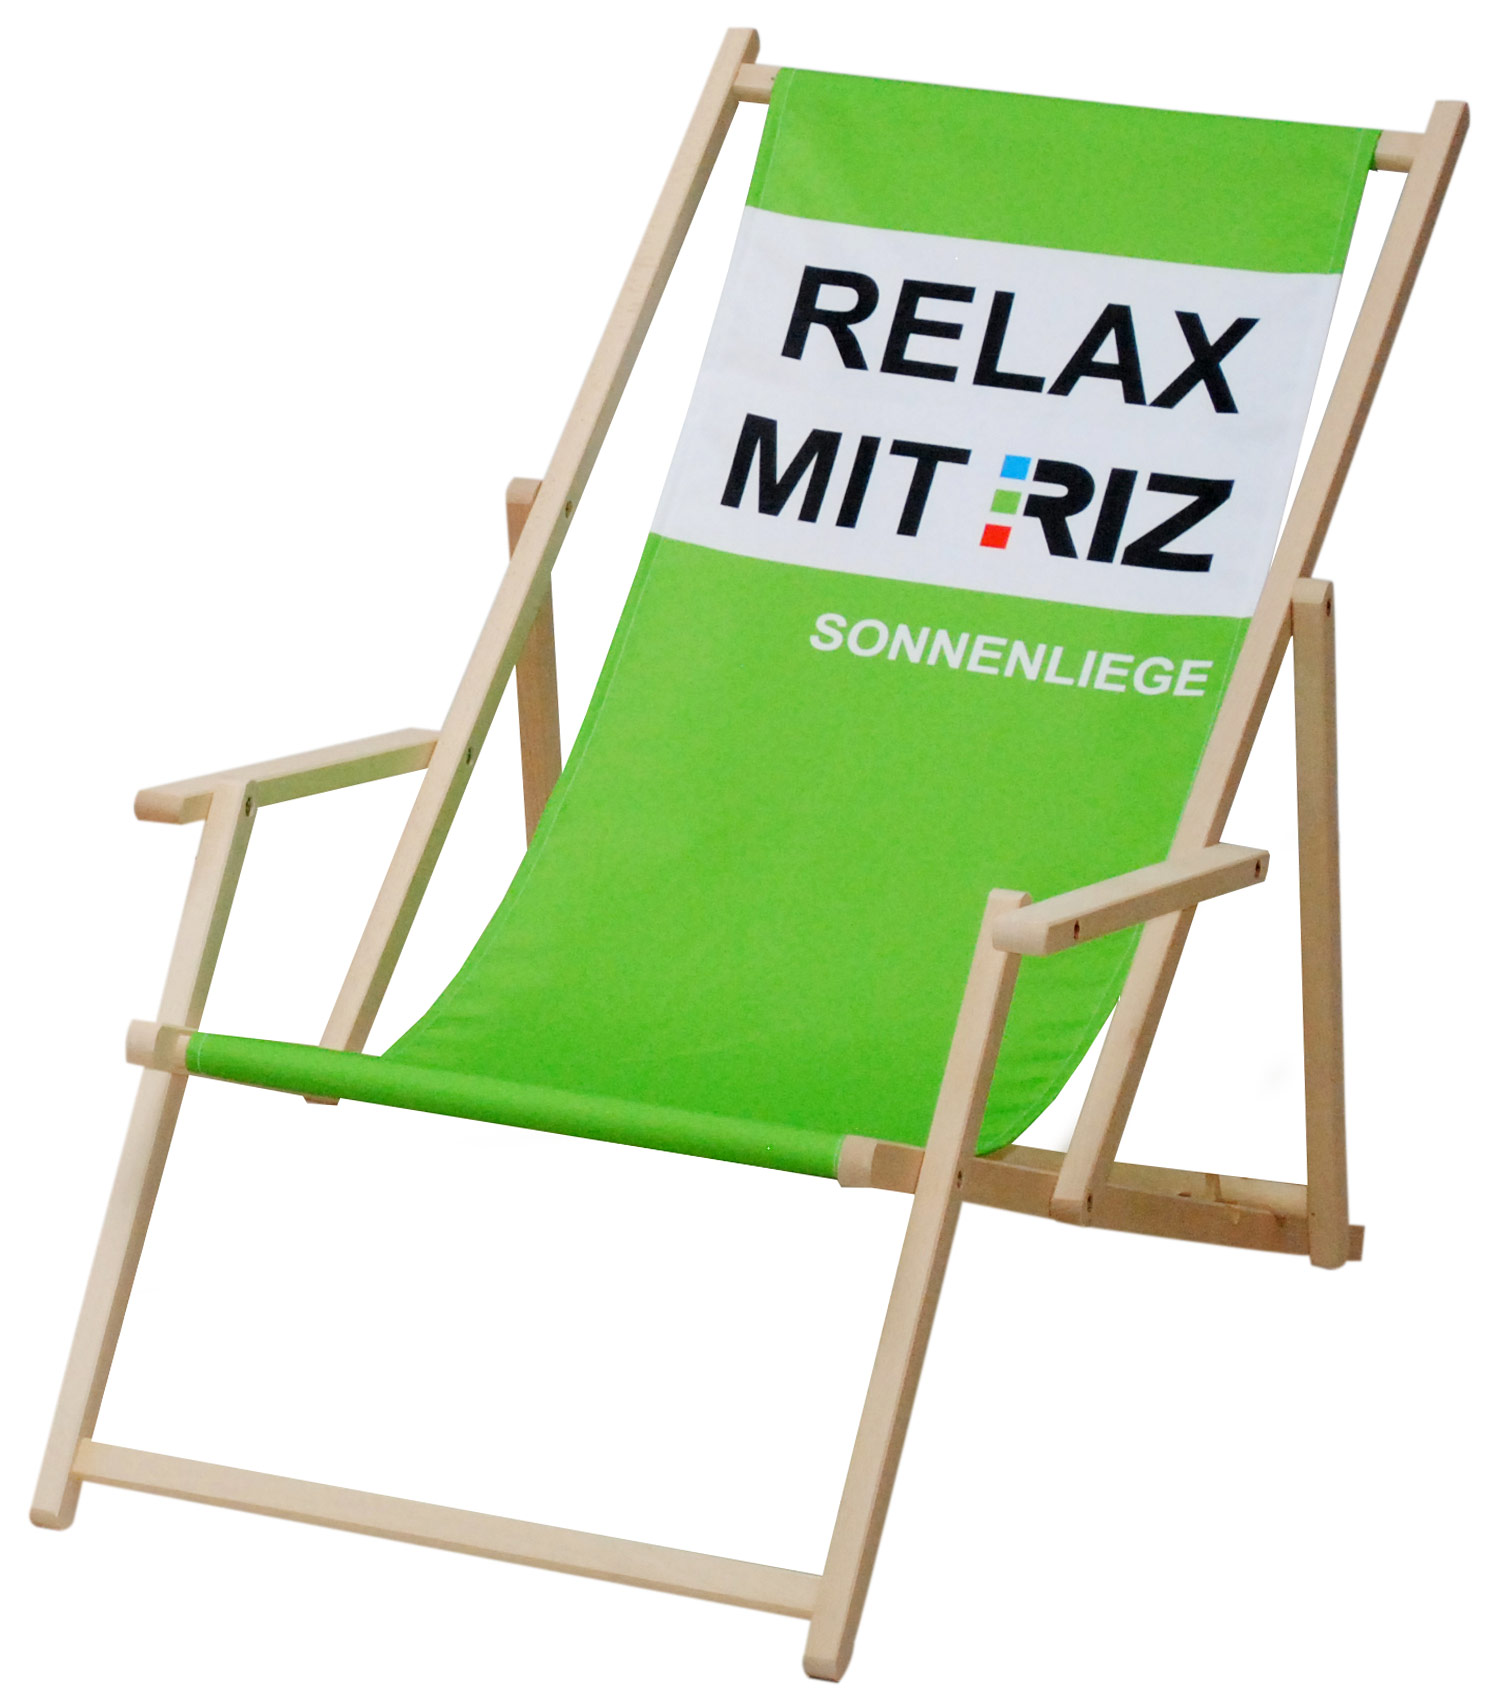 display max holzliegestuhl mit armlehne hochwertiger liegestuhl f r jedes event. Black Bedroom Furniture Sets. Home Design Ideas